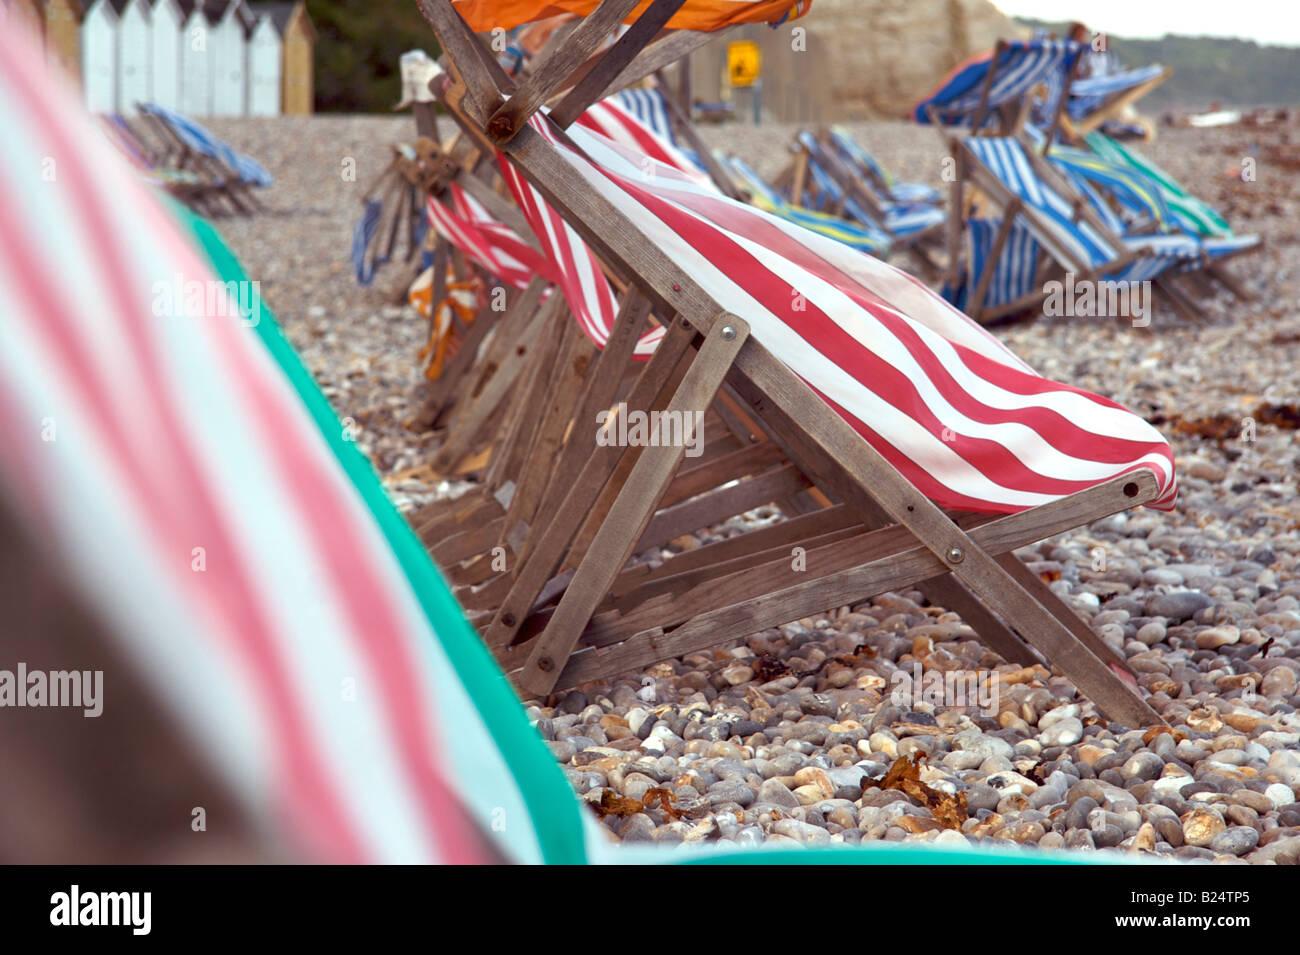 Deckchairs on the beach in Beer, Devon - Stock Image